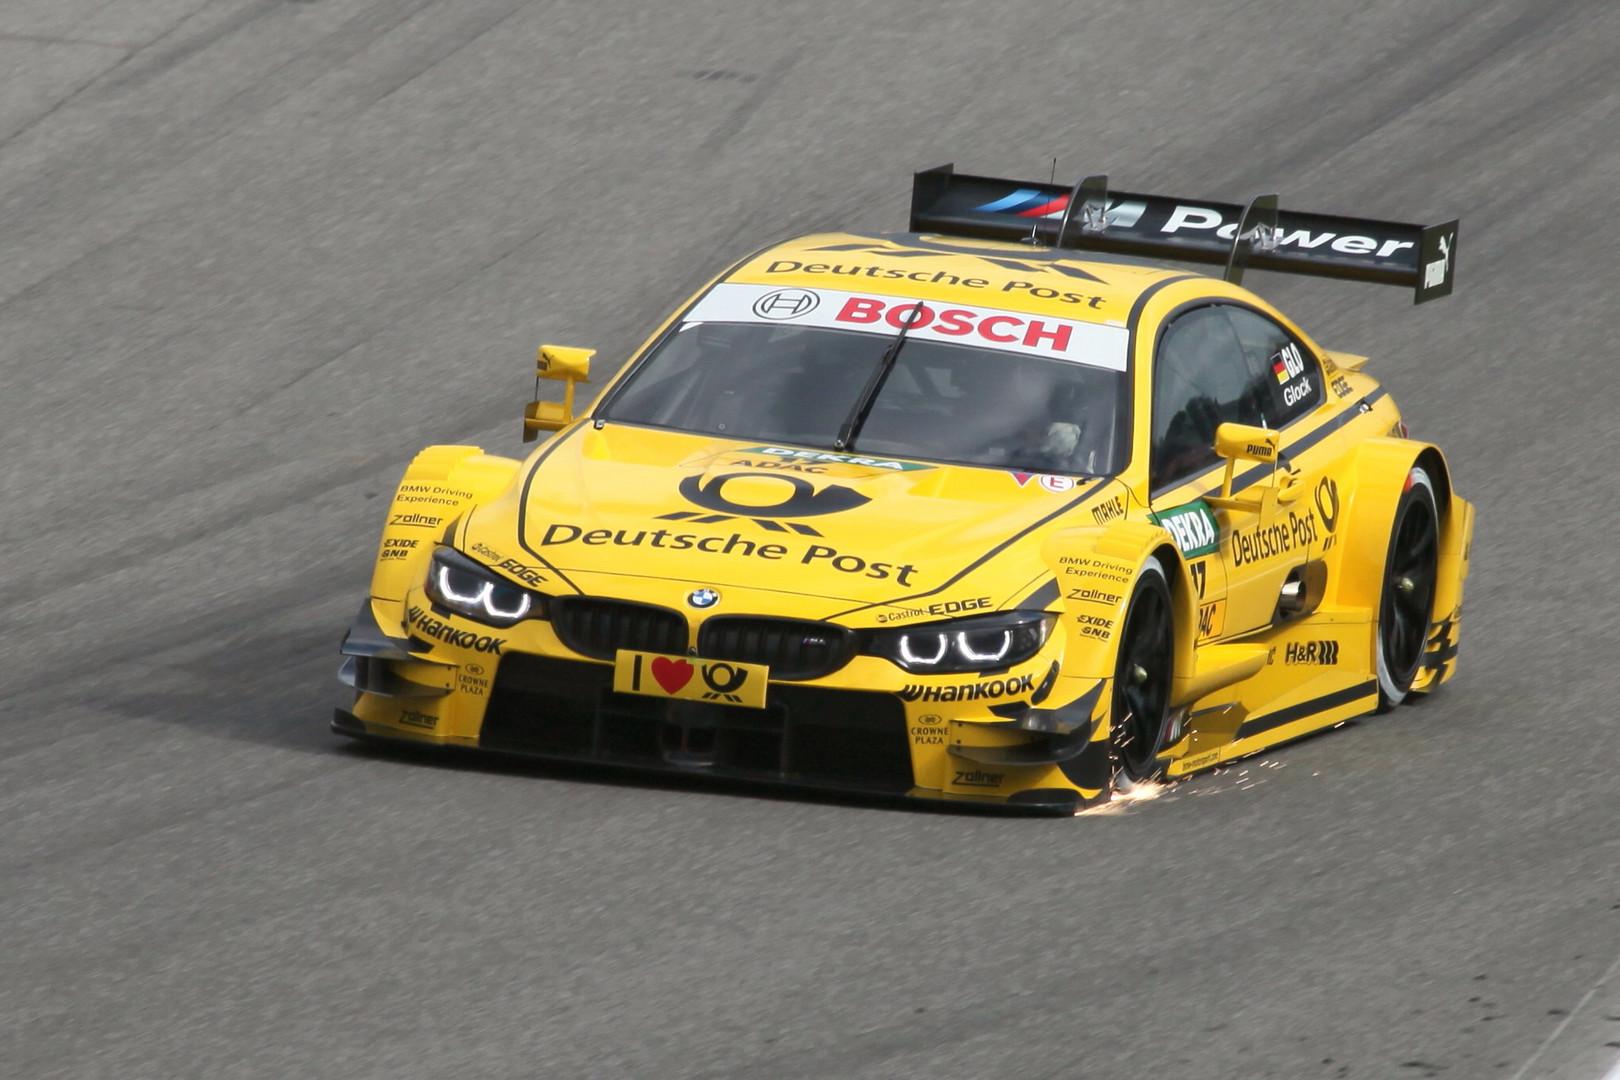 DTM Hockenheim BMW / Timo Glock